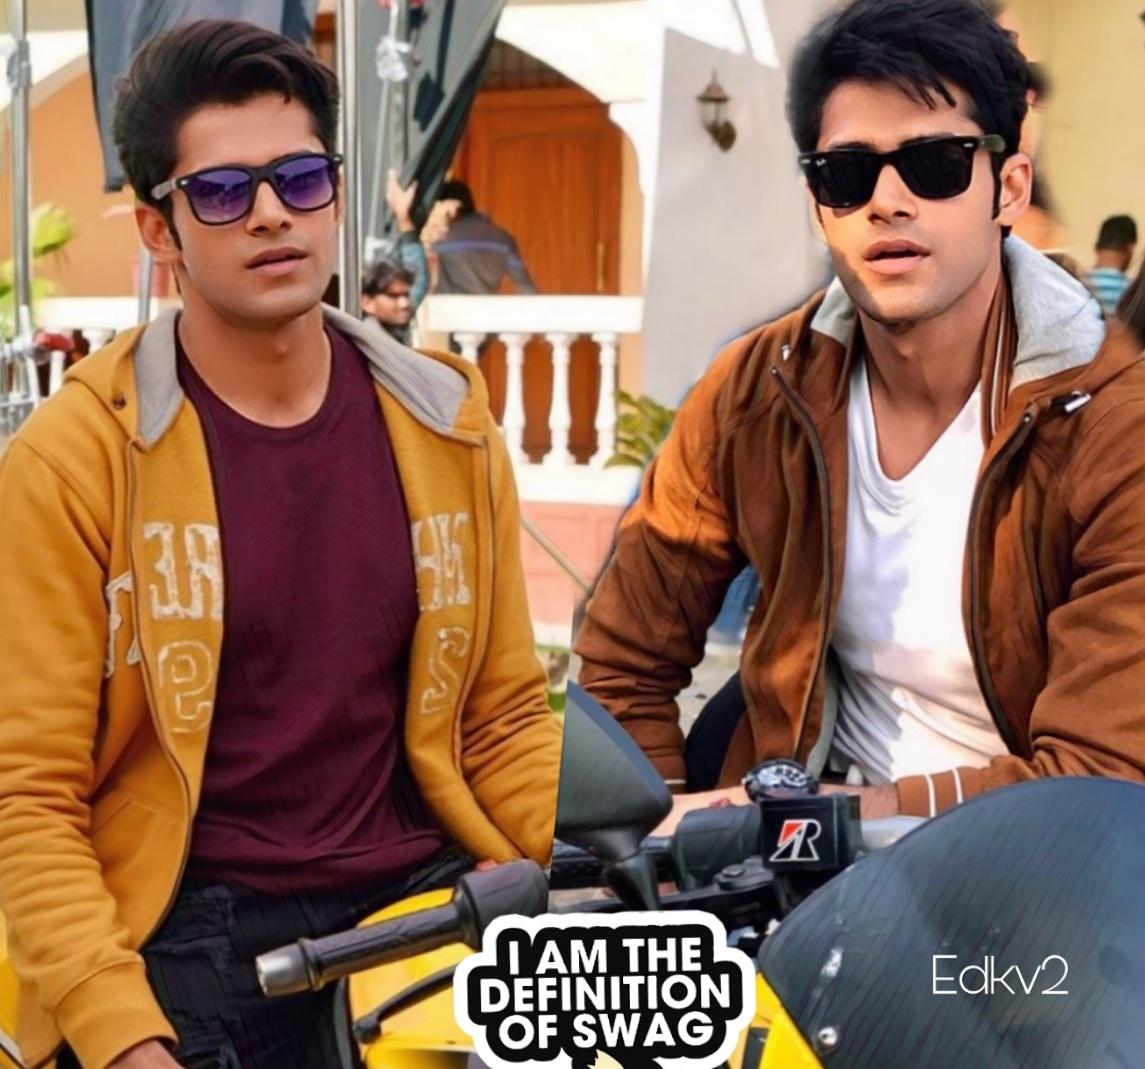 """I am the Definition of Swag"" 😎😎..#shravan #shravanmalhotra #edkv #edkv2 #ekdujekevaaste #ekdujekevaaste2 #mohitkumar #sonytv"